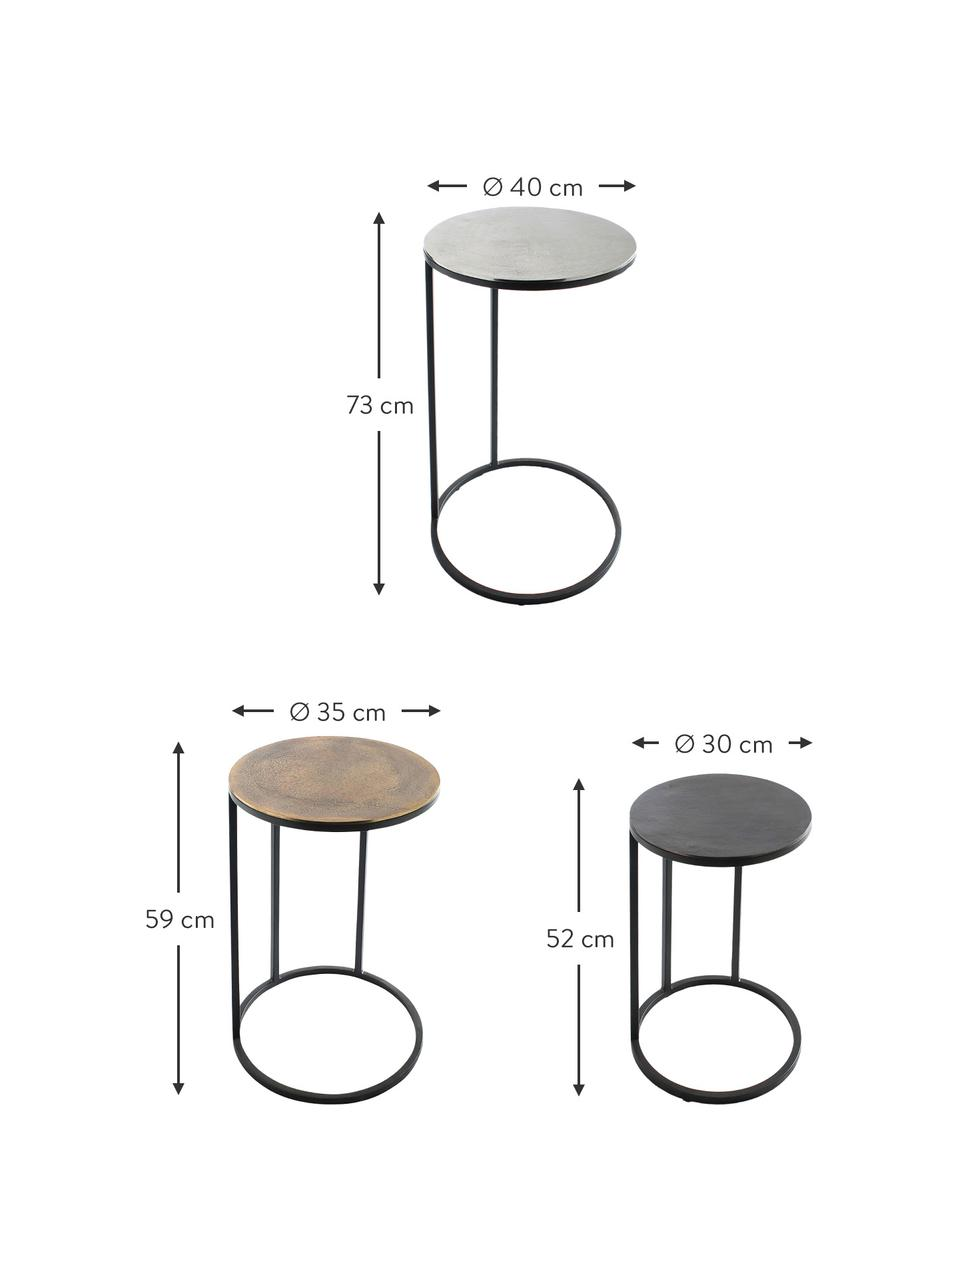 Table d'appoint gigogne métal Calvin, 3élém., Aluminium, laiton